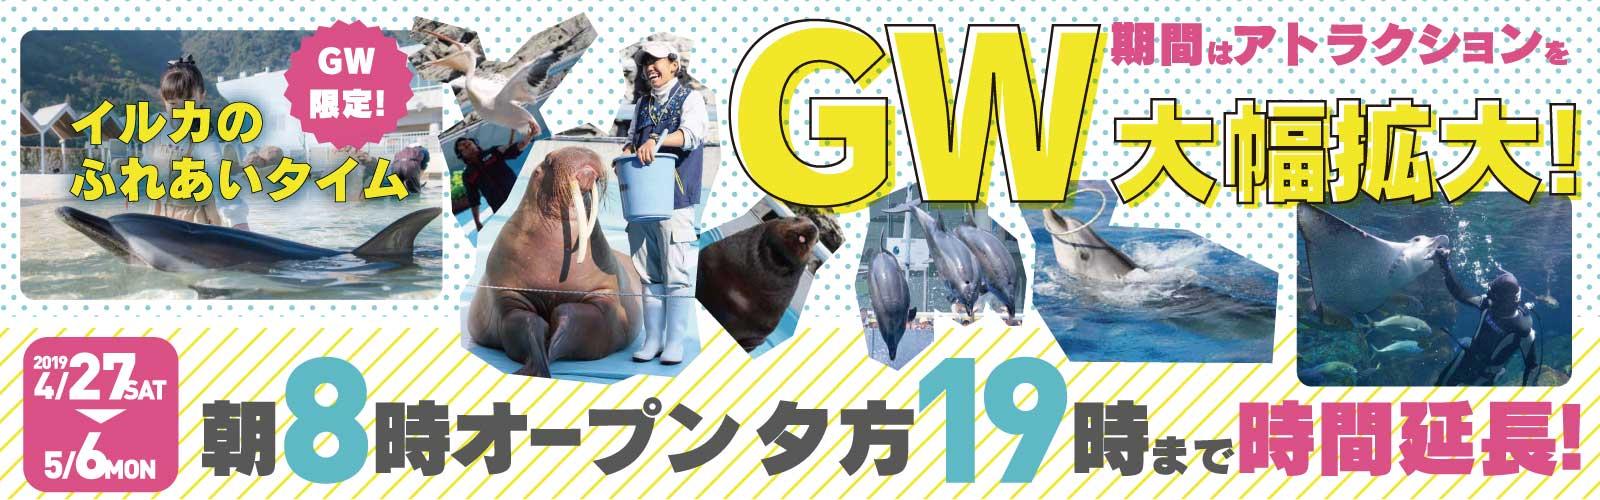 2019GW1